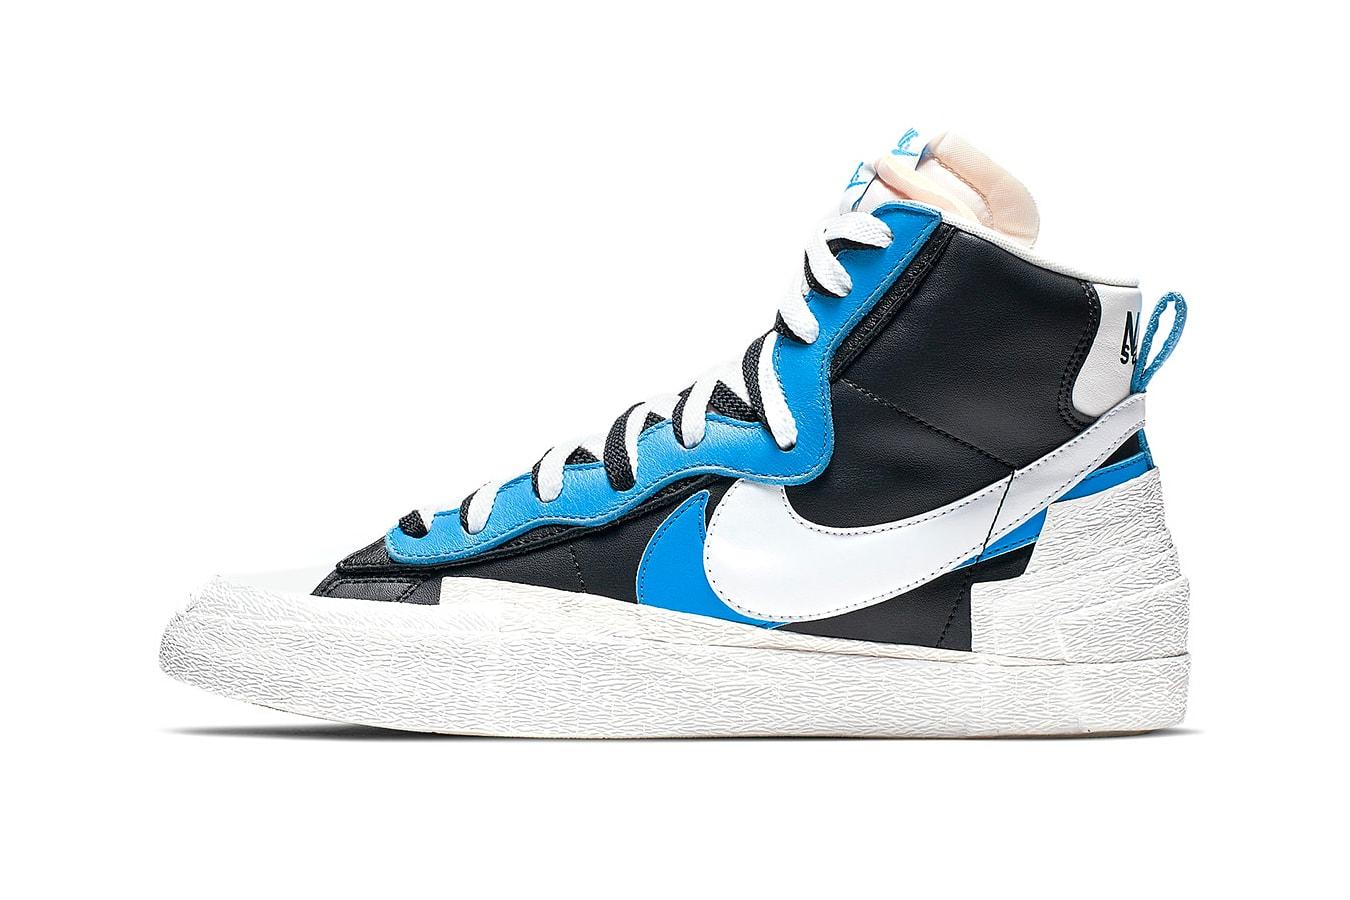 Best Sneaker Releases: April 2019 Week 3 bape a bathing ape NEIGHBORHOOD  adidas Originals NMD POD S-3.1 nike Kiko Kostadinov ASICS JW Anderson Converse